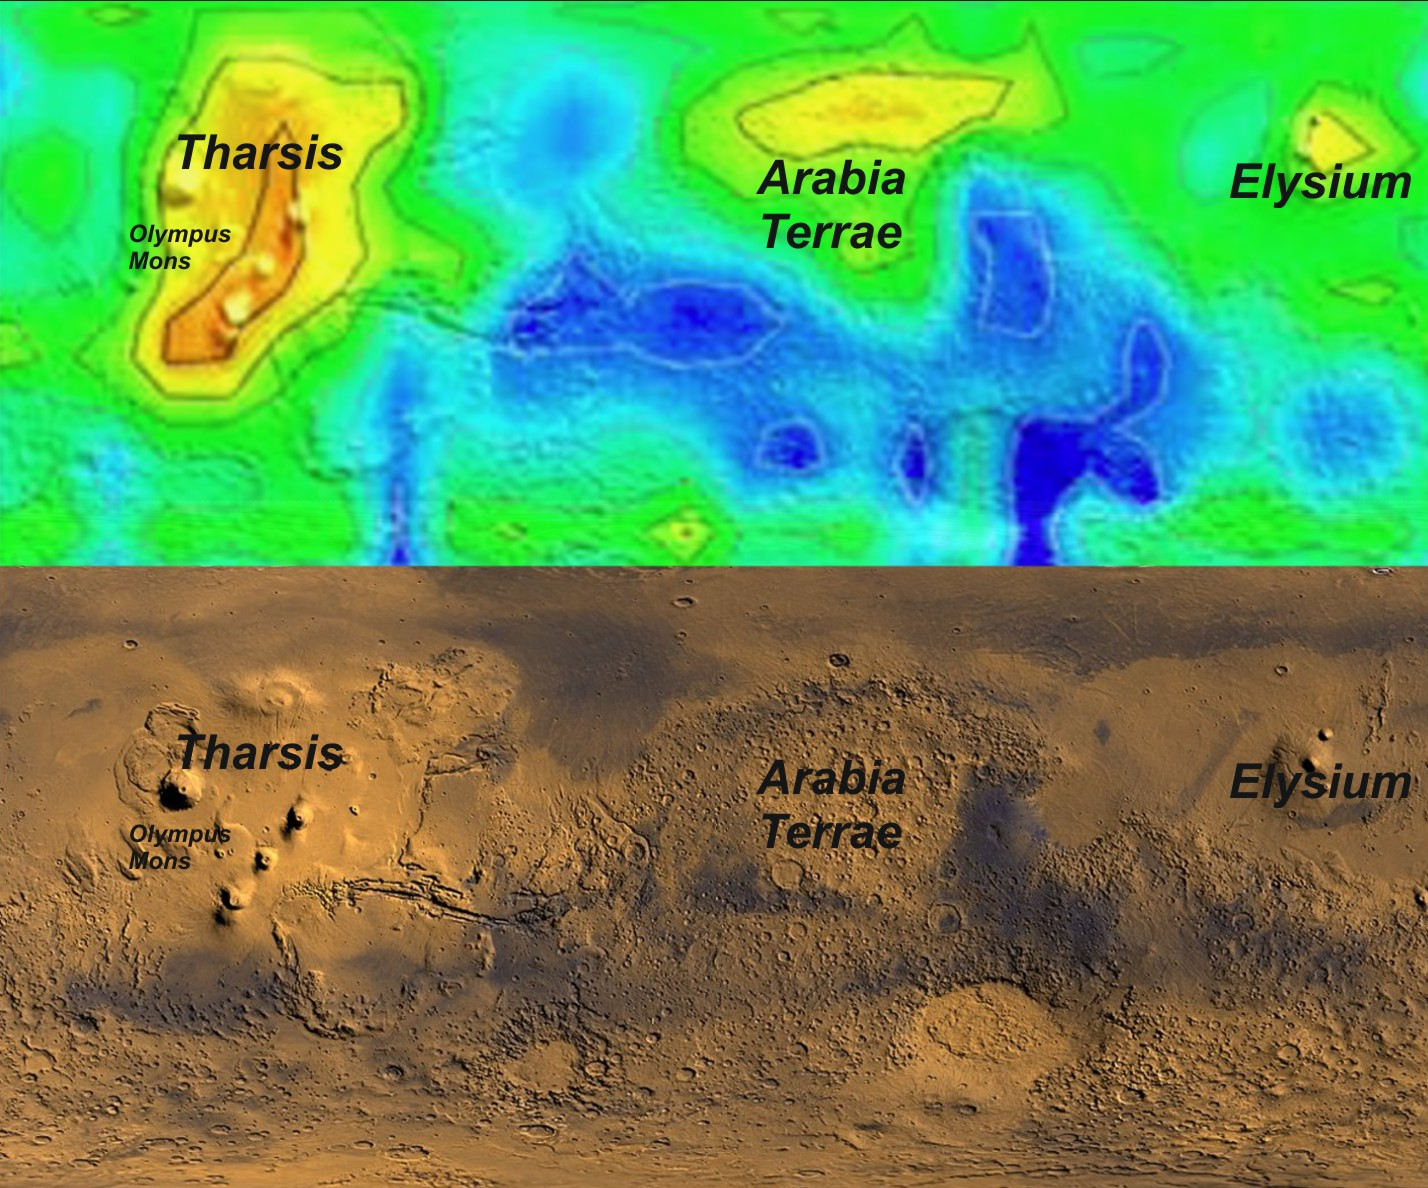 http://1.bp.blogspot.com/_JlhvjWXE_Ik/TJs0PS1ZBrI/AAAAAAAAApU/2t-xsXfkjYA/s1600/mars_methane_map.jpg